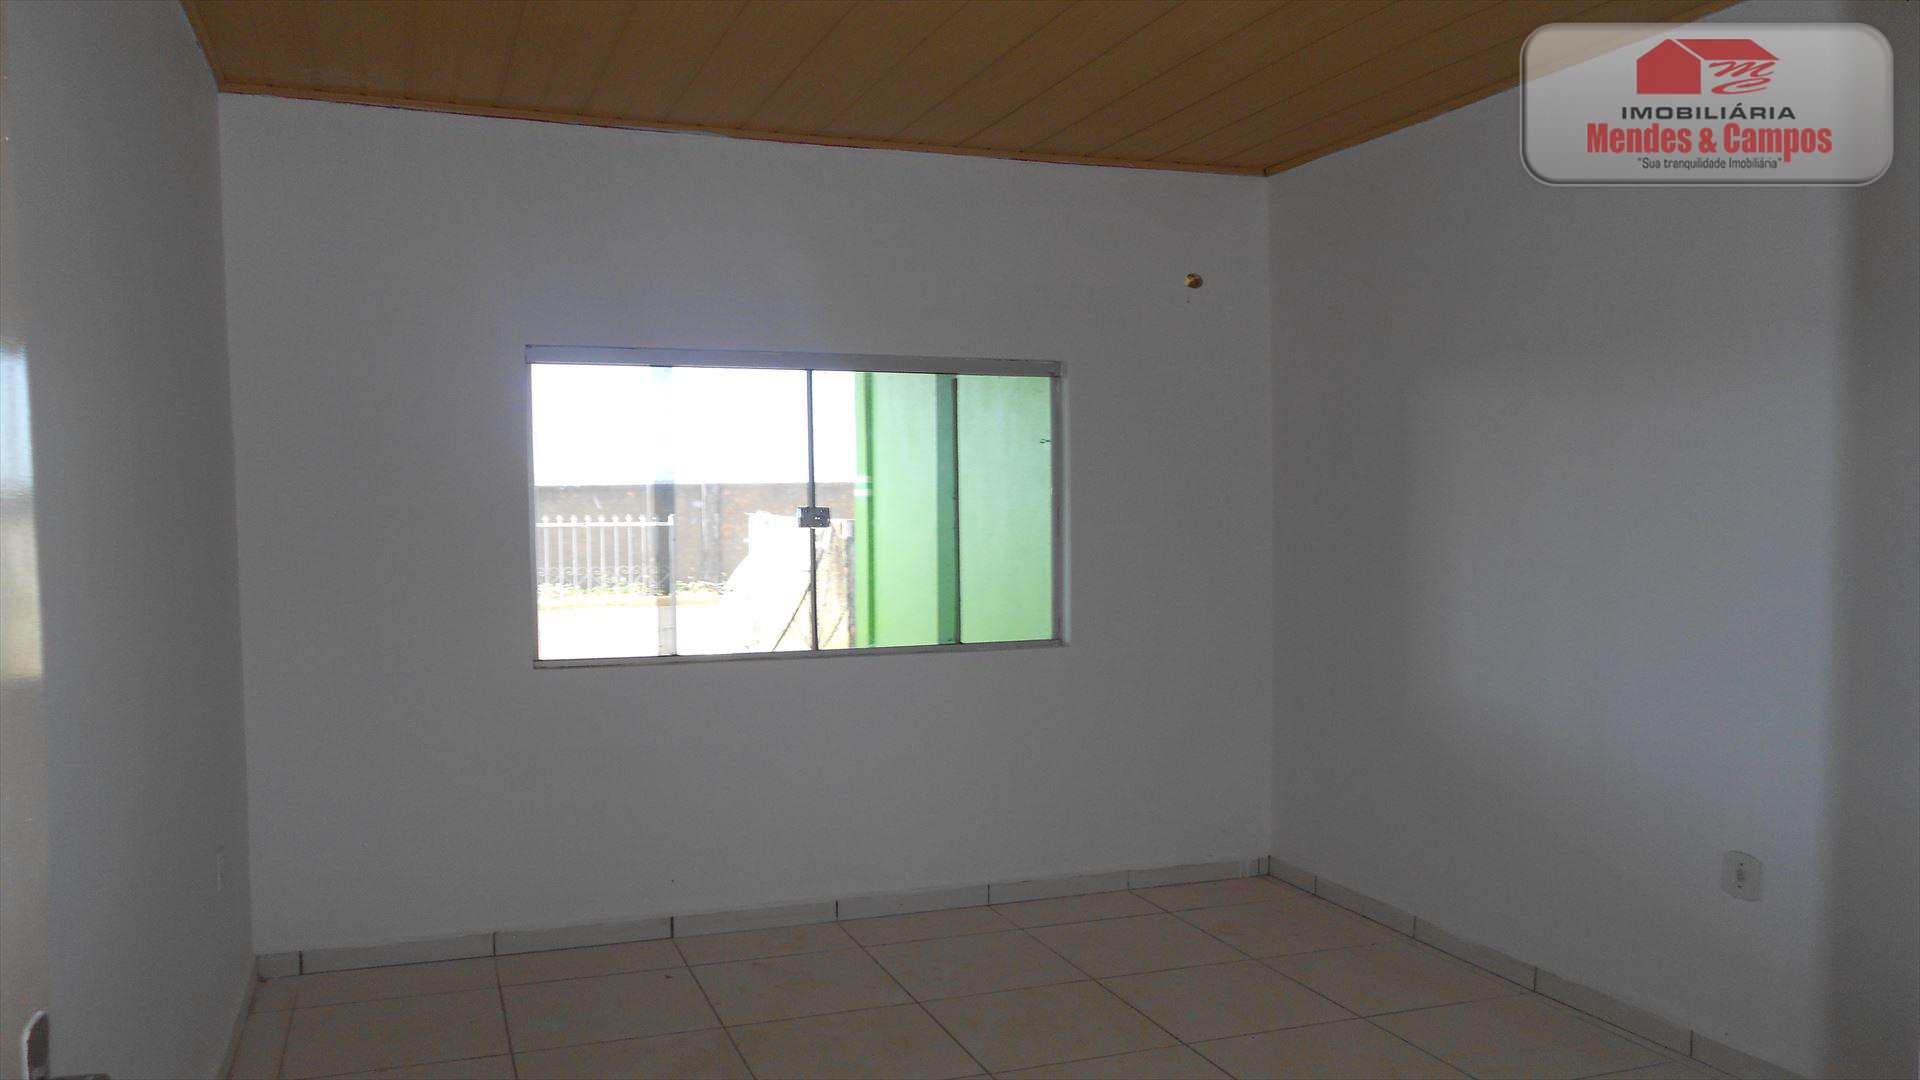 Rua Pres.Castelo Branco nº2521 Casa